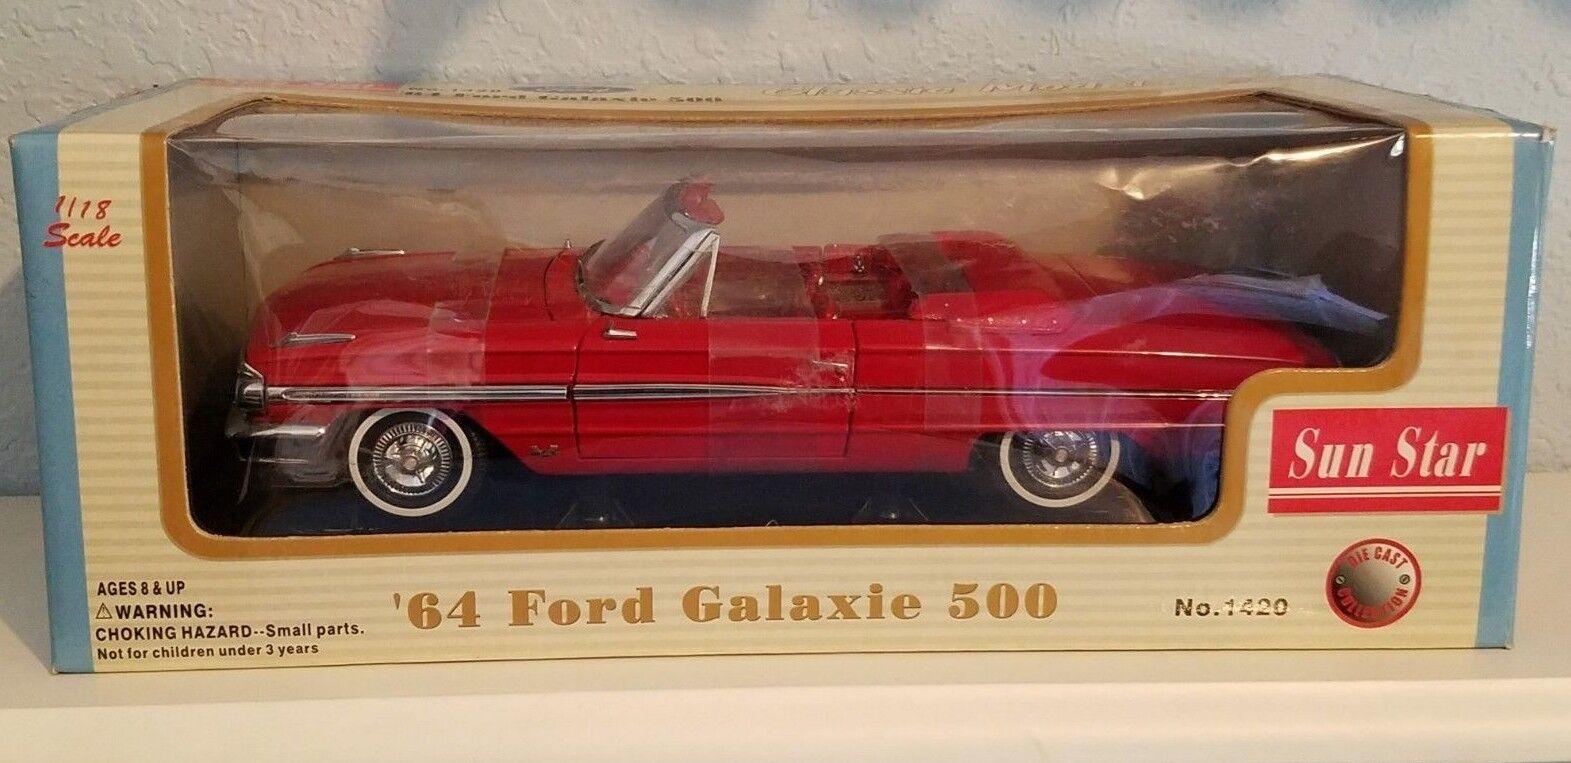 1 18 SUN STAR 1964 FORD GALAXIE 500 CONgreenIBLE RED pd